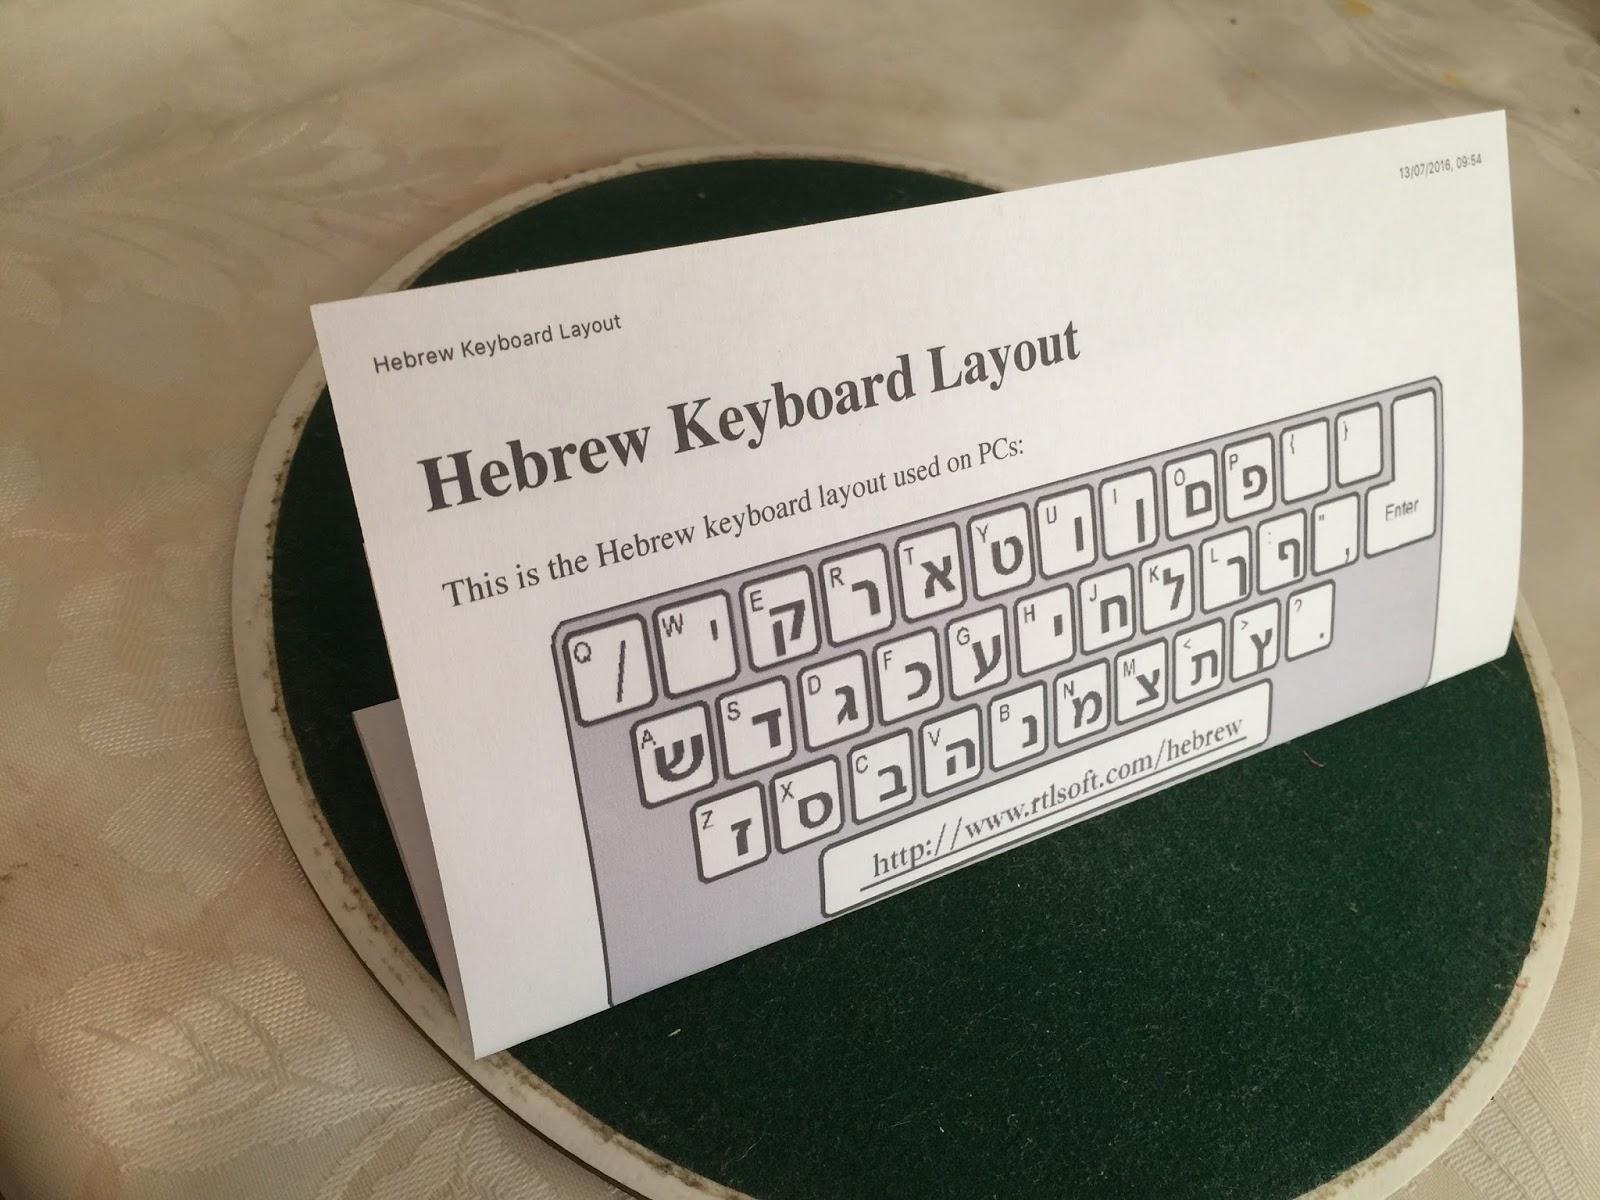 Travel with Angela Lansbury: Printing alphabets and Keyboard